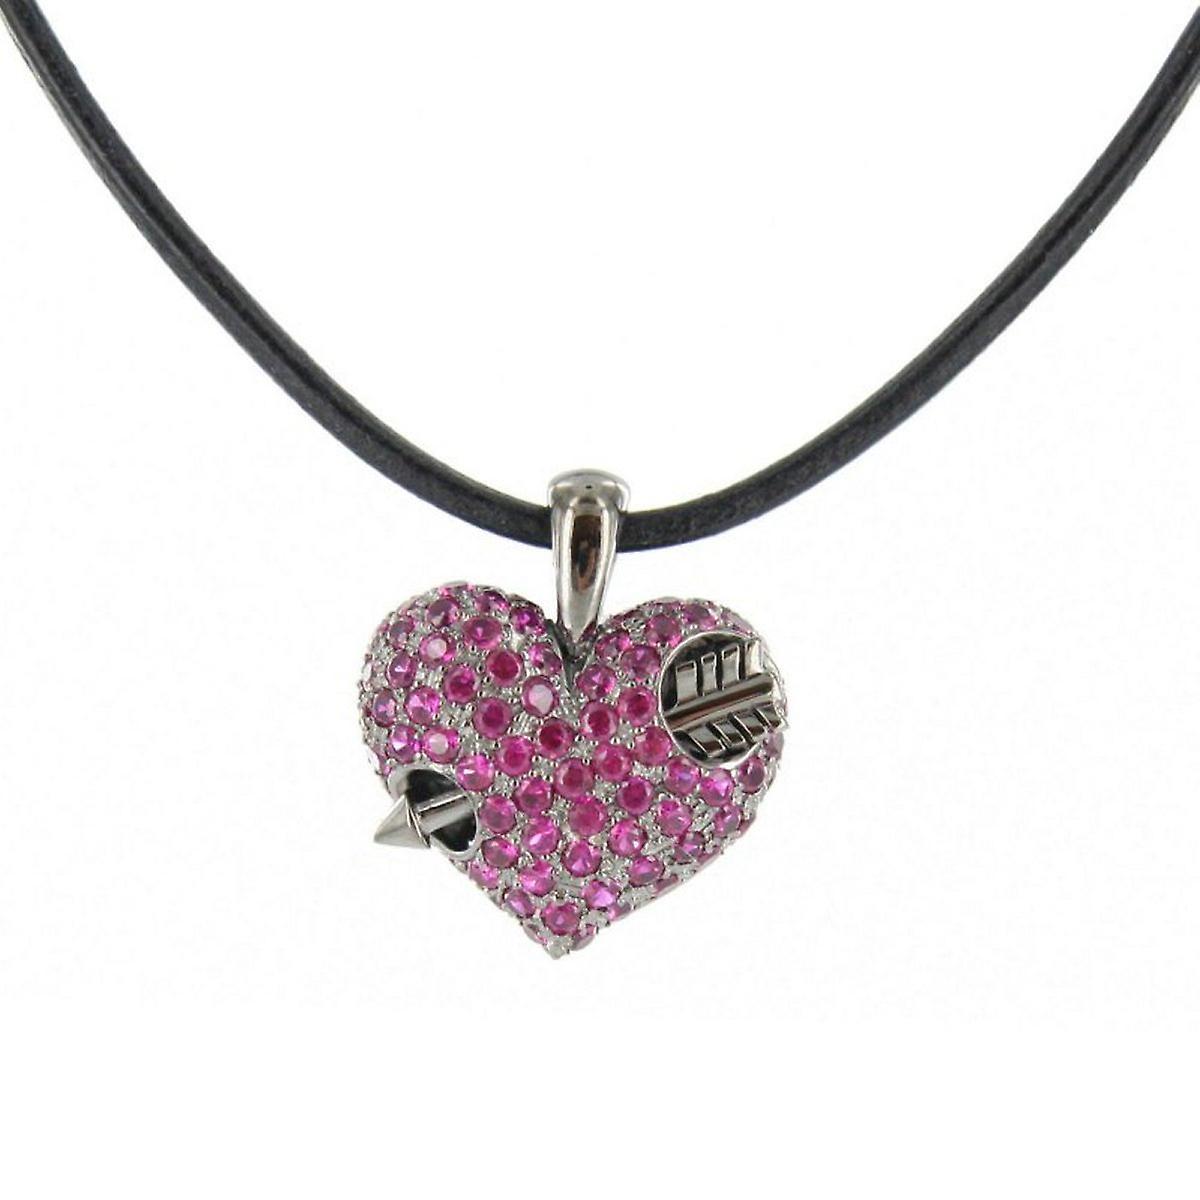 Heartbreaker by Drachenfels Ladies silver pendant necklace LD AT 52 RE-B